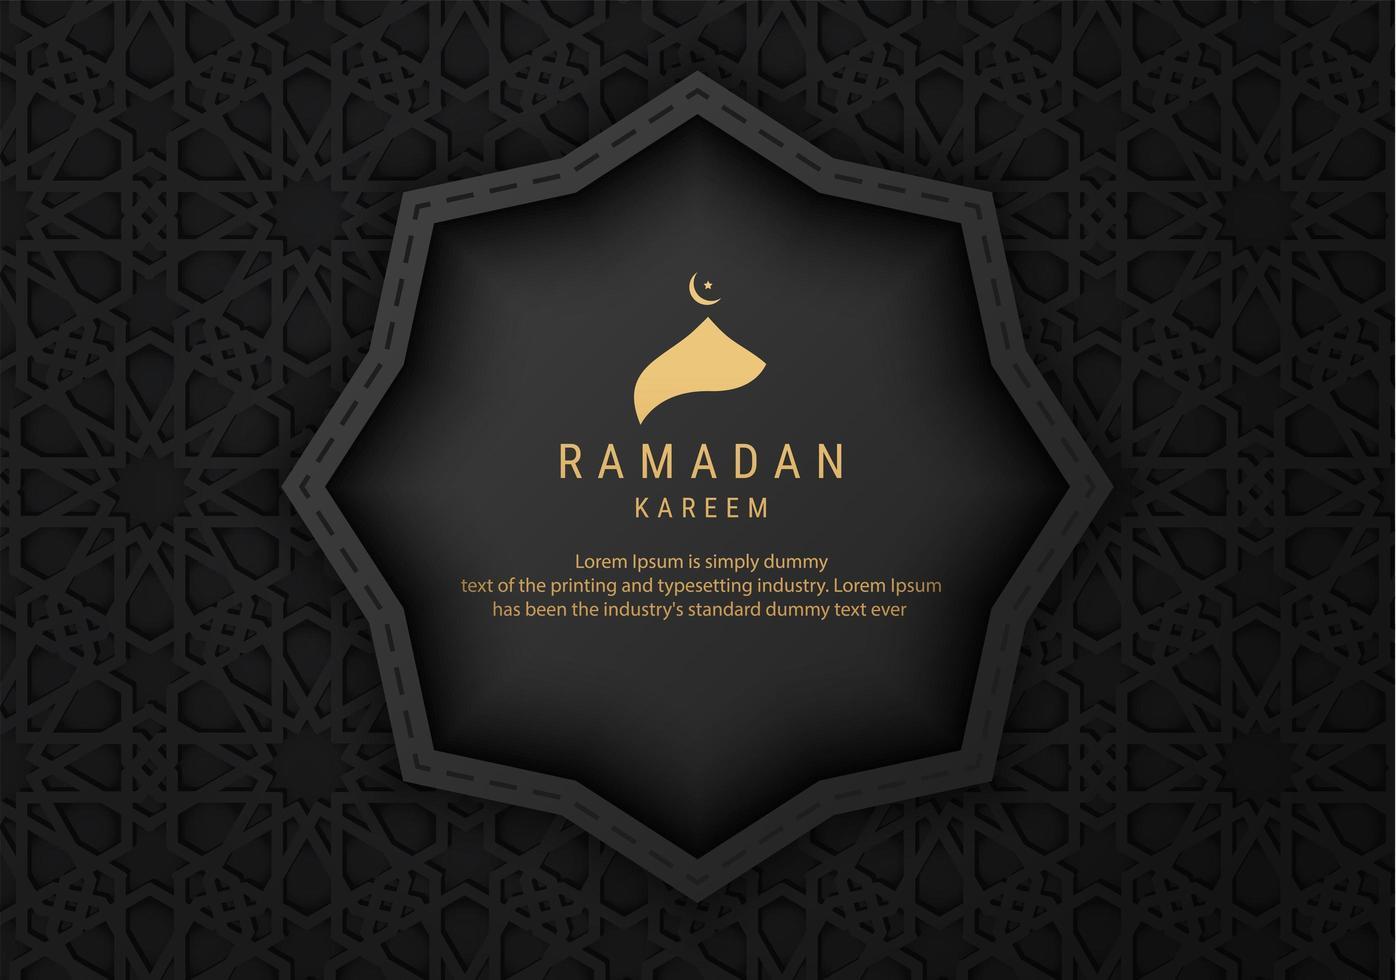 banner di ramadan kareem ornato nero vettore